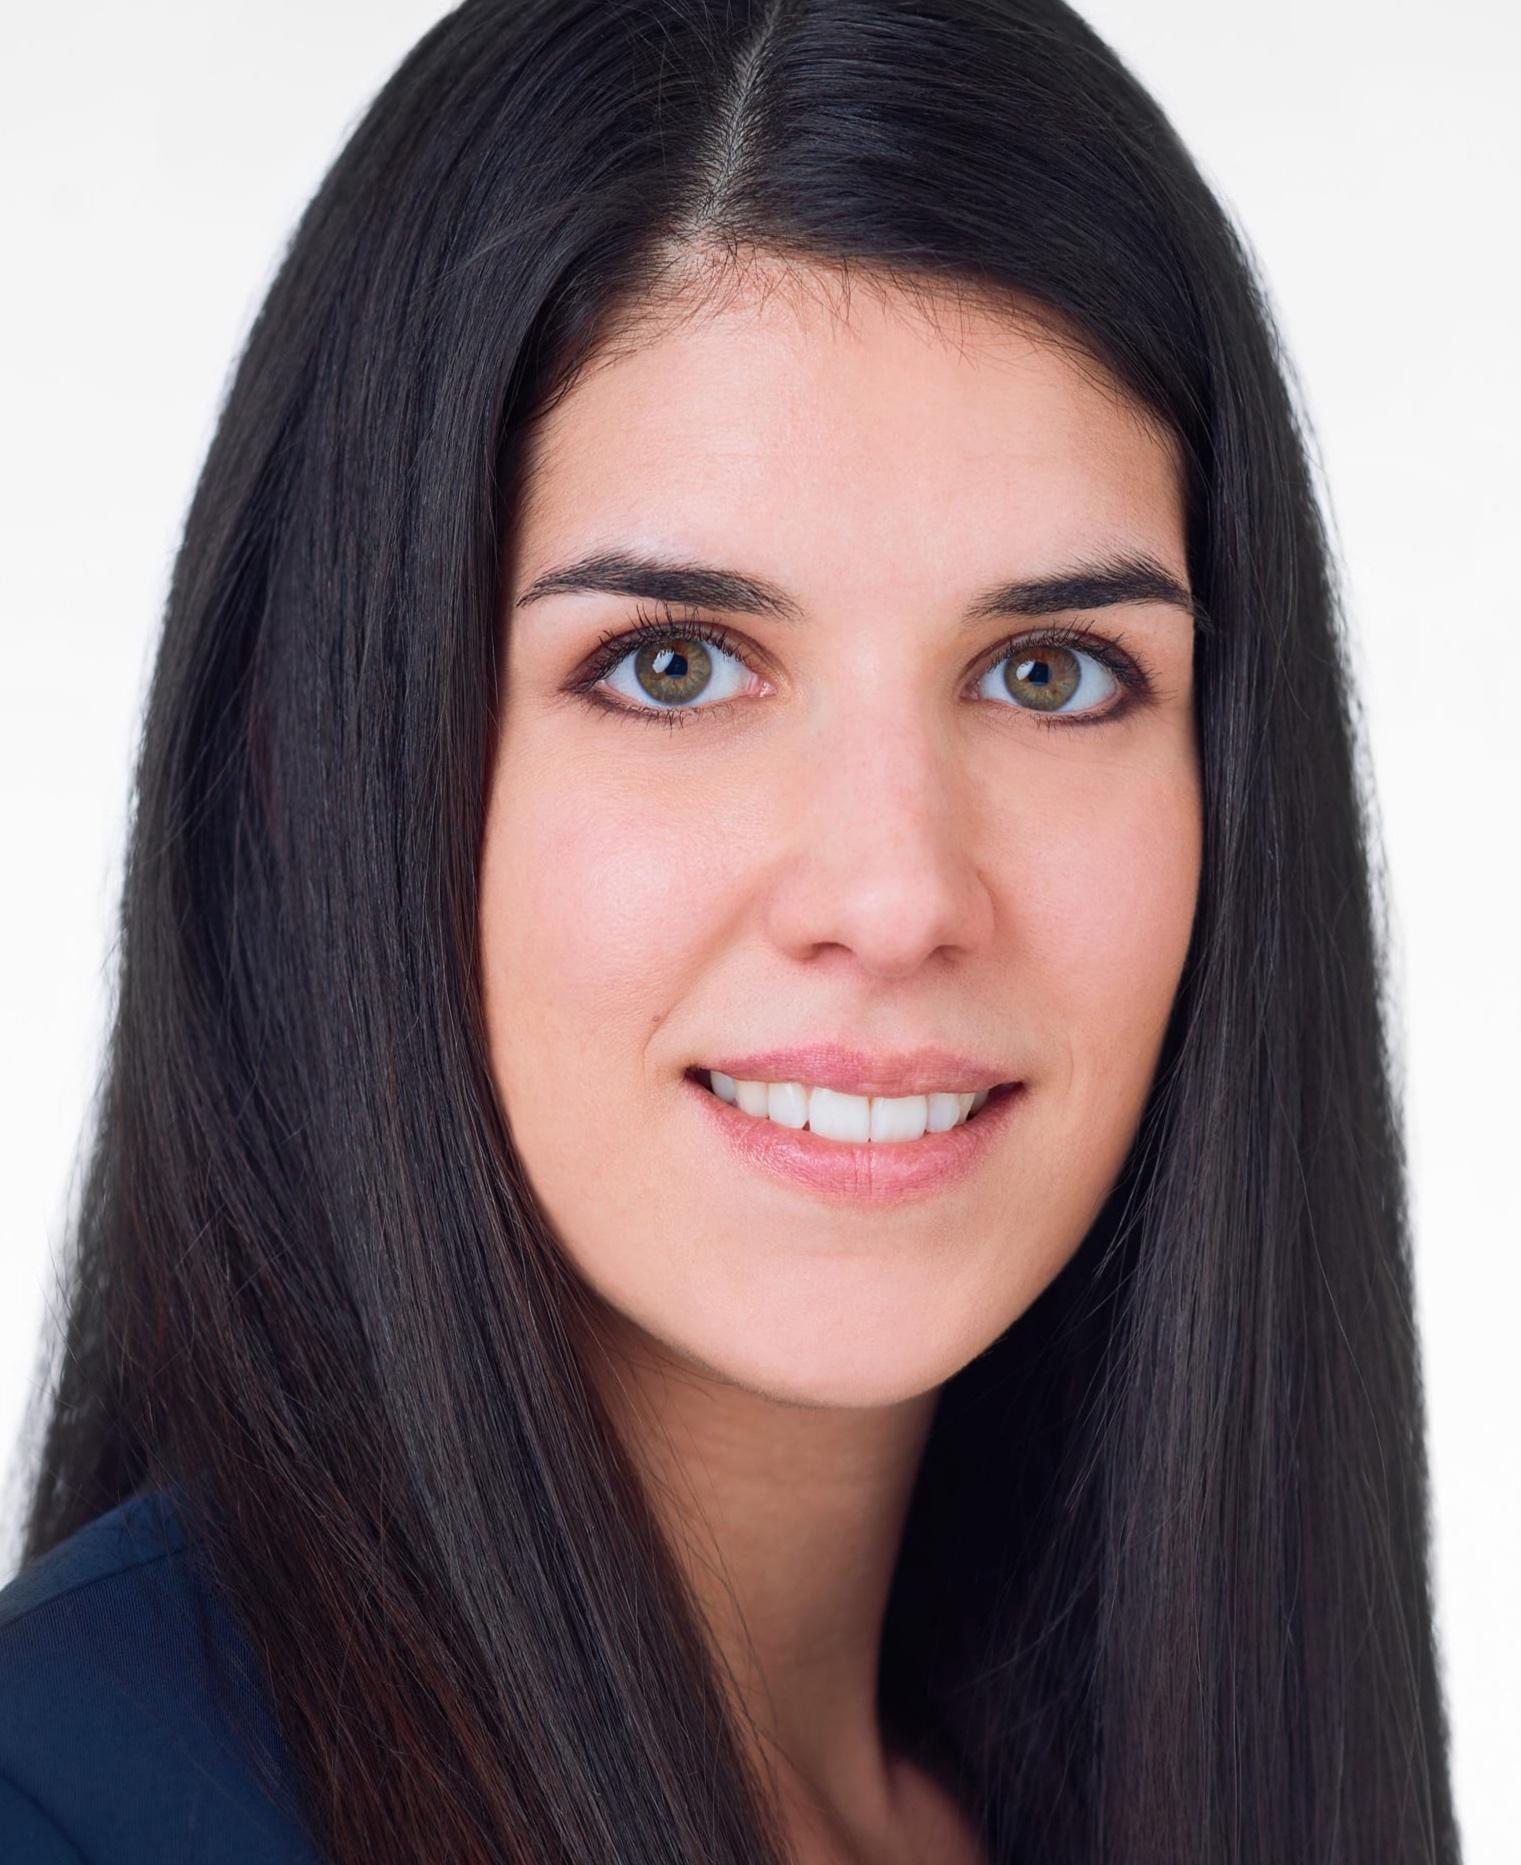 Mag. Johanna Koller   seit 02/2019 Rechtsanwaltsanwärterin bei Mag. Thomas Reisch